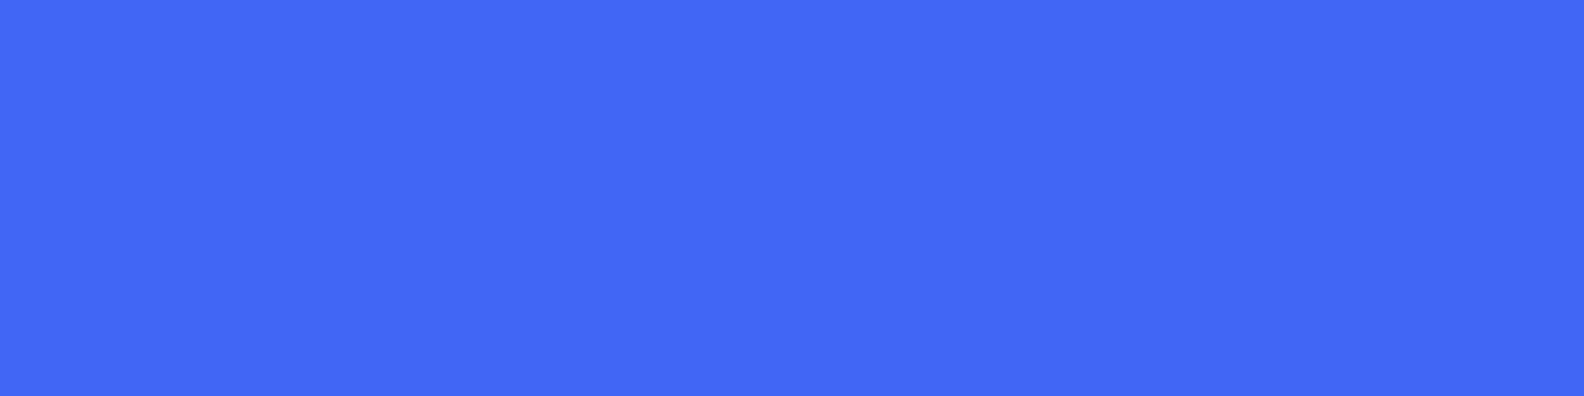 1584x396 Ultramarine Blue Solid Color Background